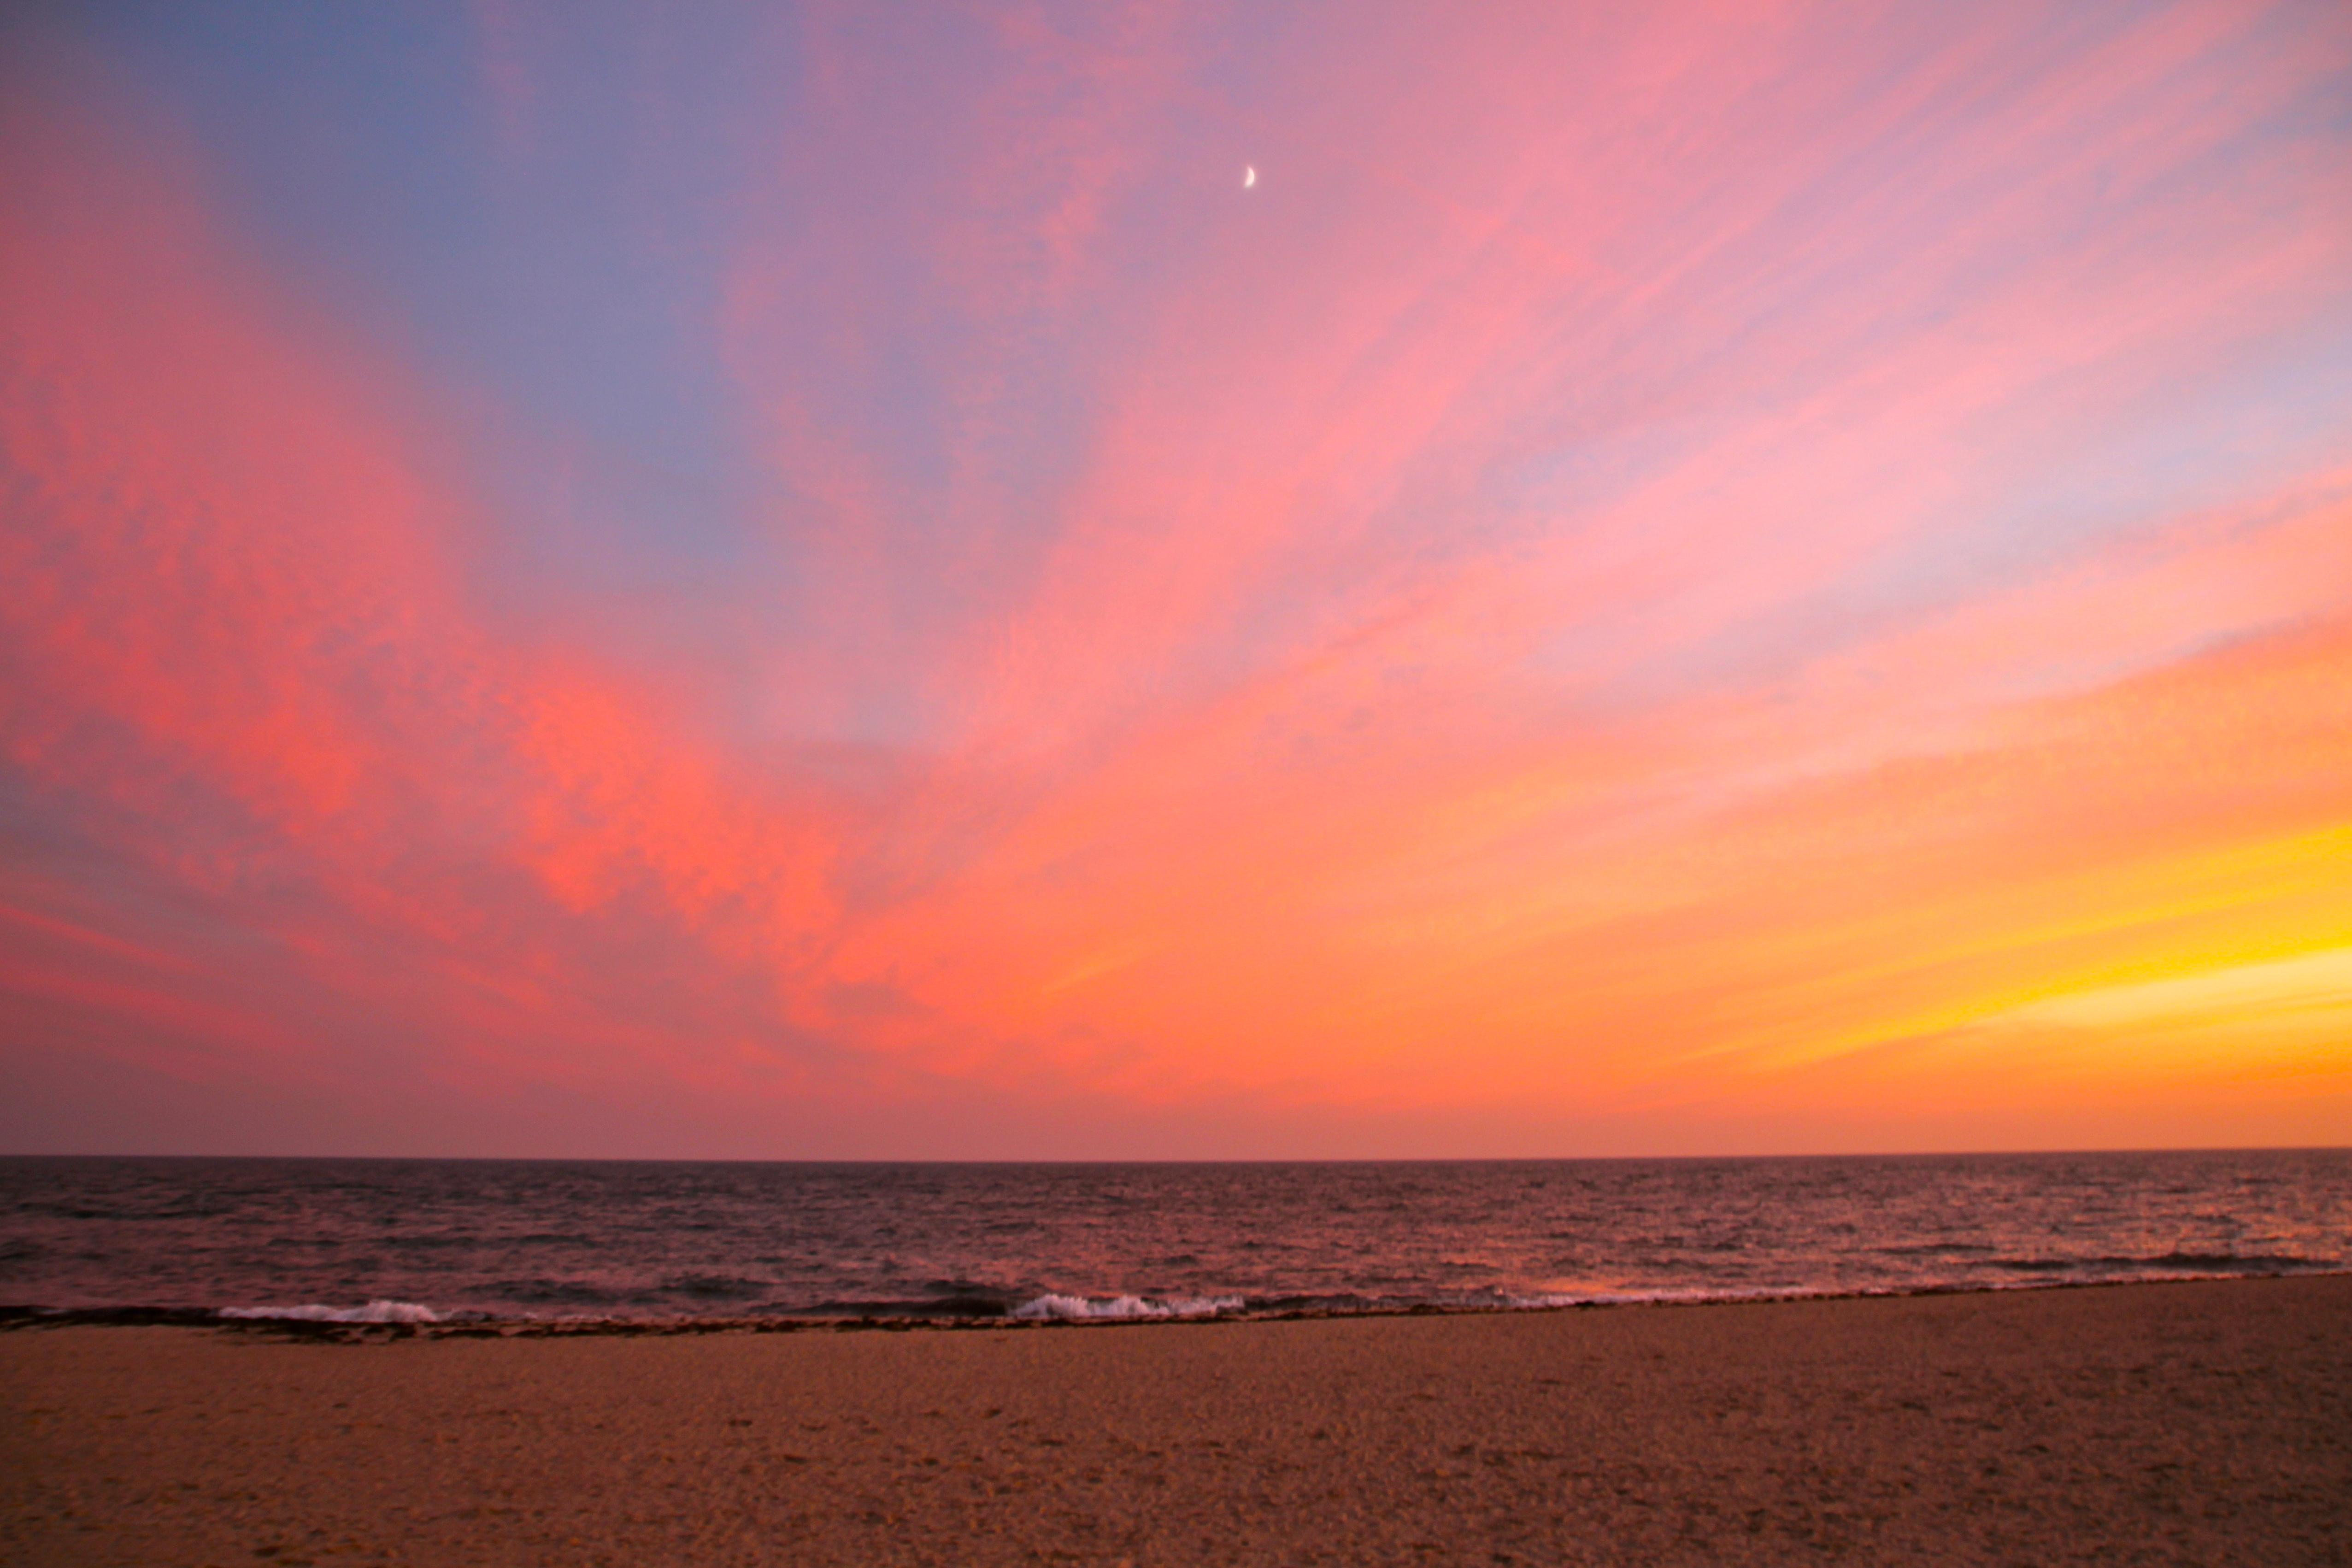 Cape Cod Sunset over Atlantic